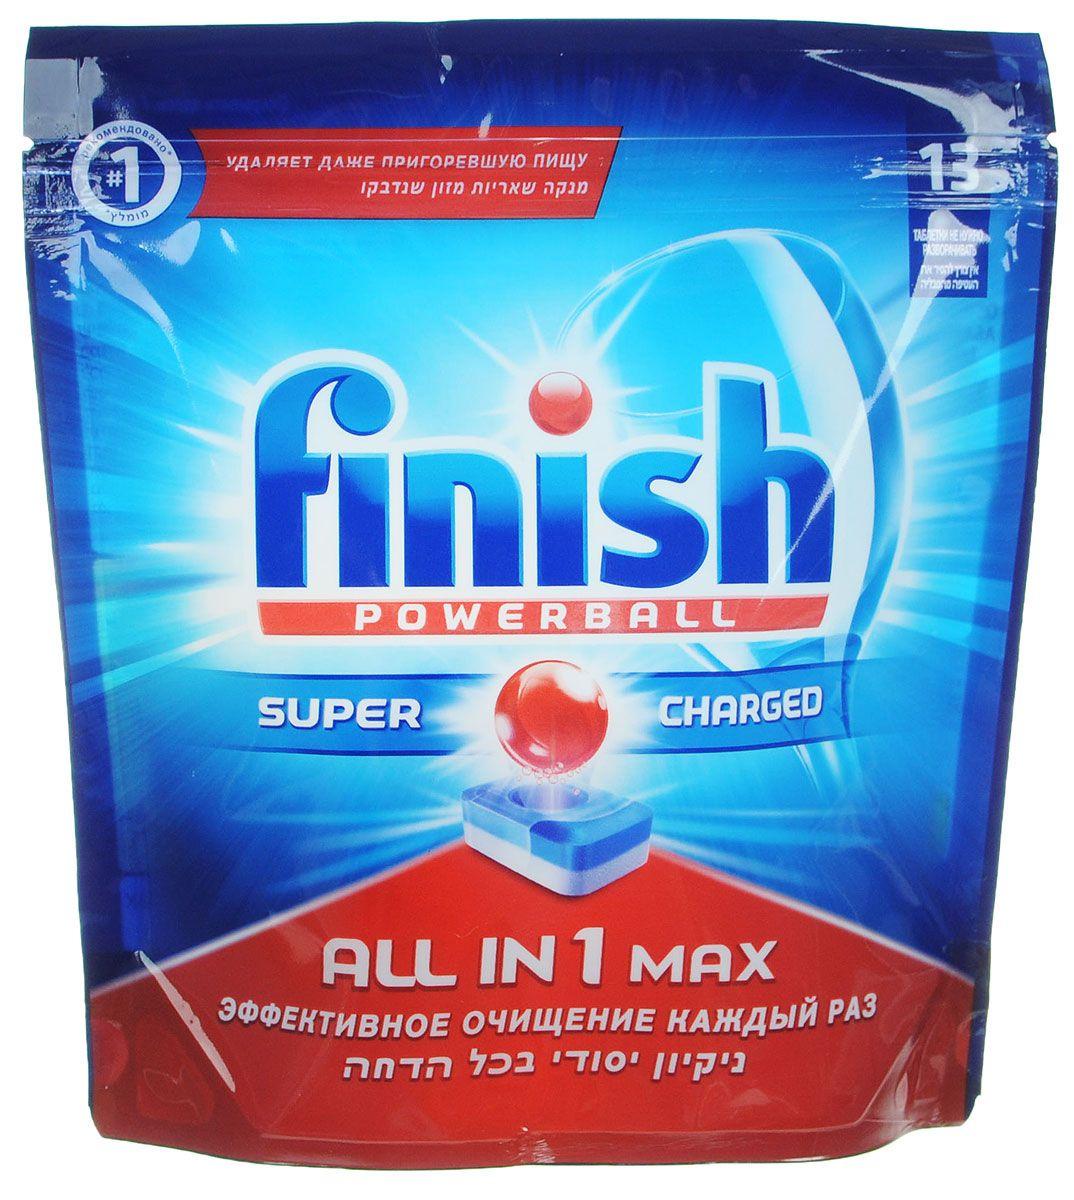 Таблетки для посудомоечных машин Finish All in 1 max, 13шт таблетки для посудомоечных машин clean